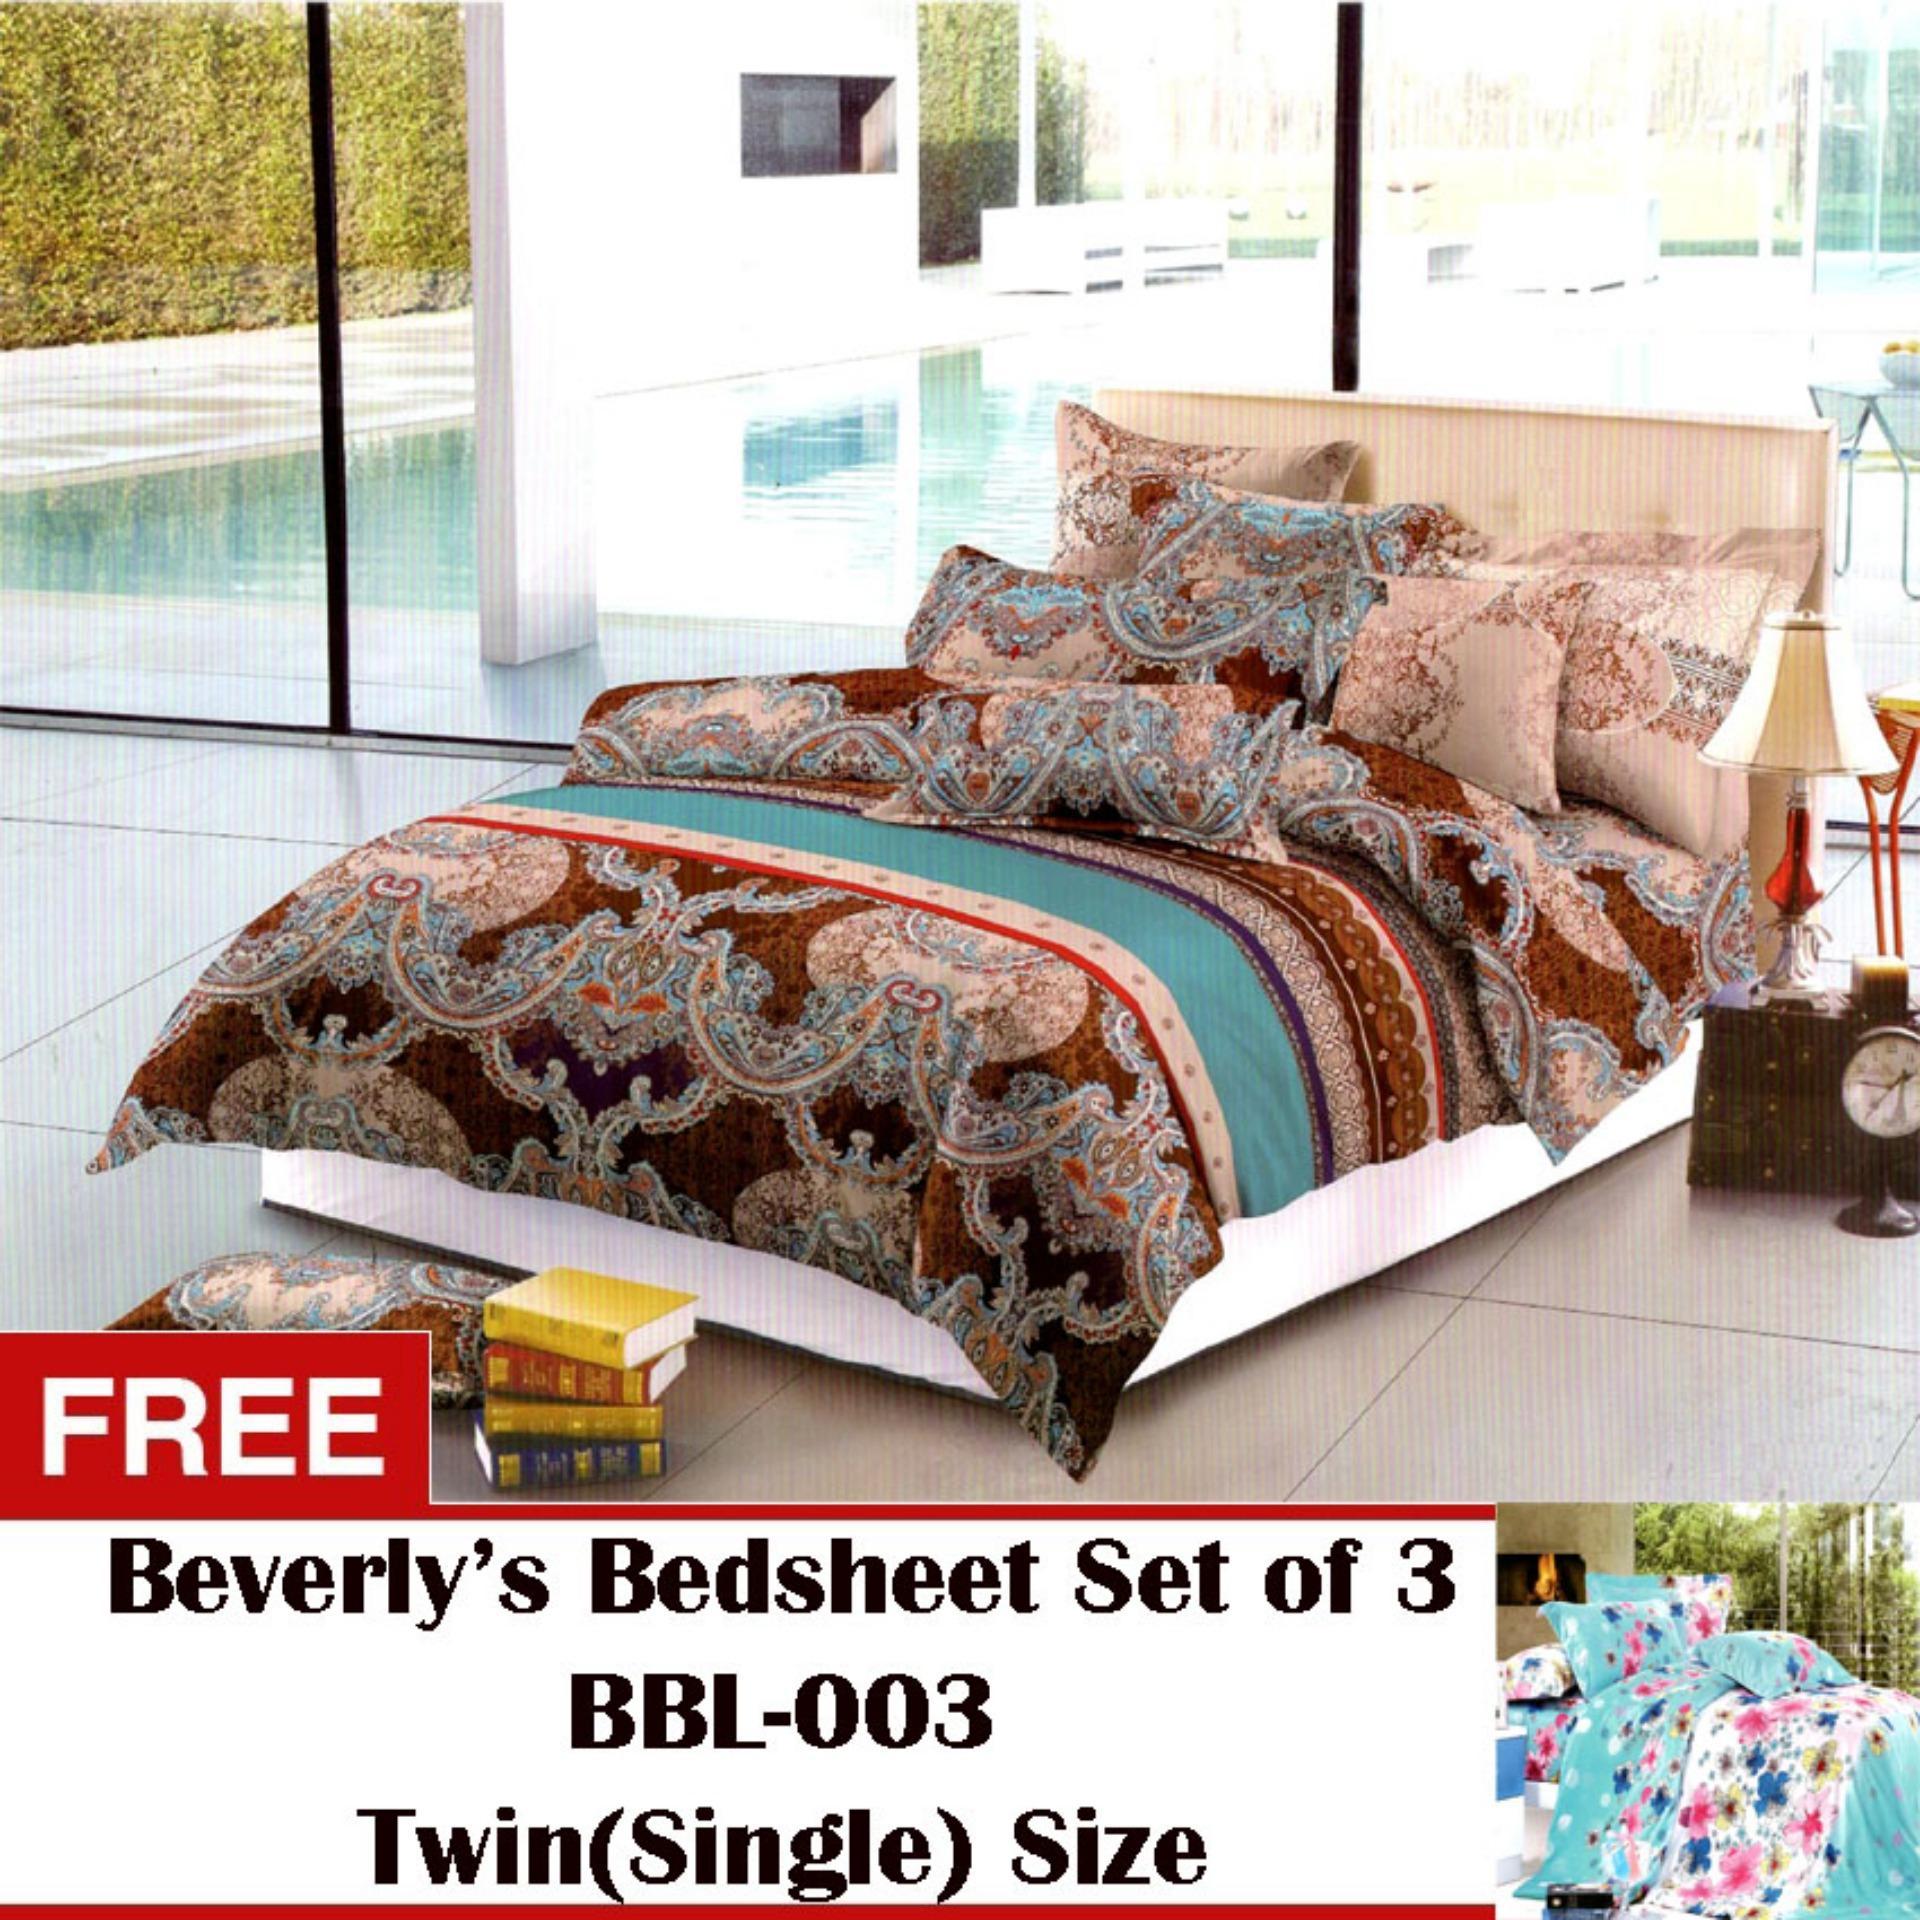 Beverly's Linen Collection Bedsheet Set of 3(BBL-107)Full(Double)with Free Beverly's Linen Collection Bedsheet Set of3(BBL-003)Twin(Single)